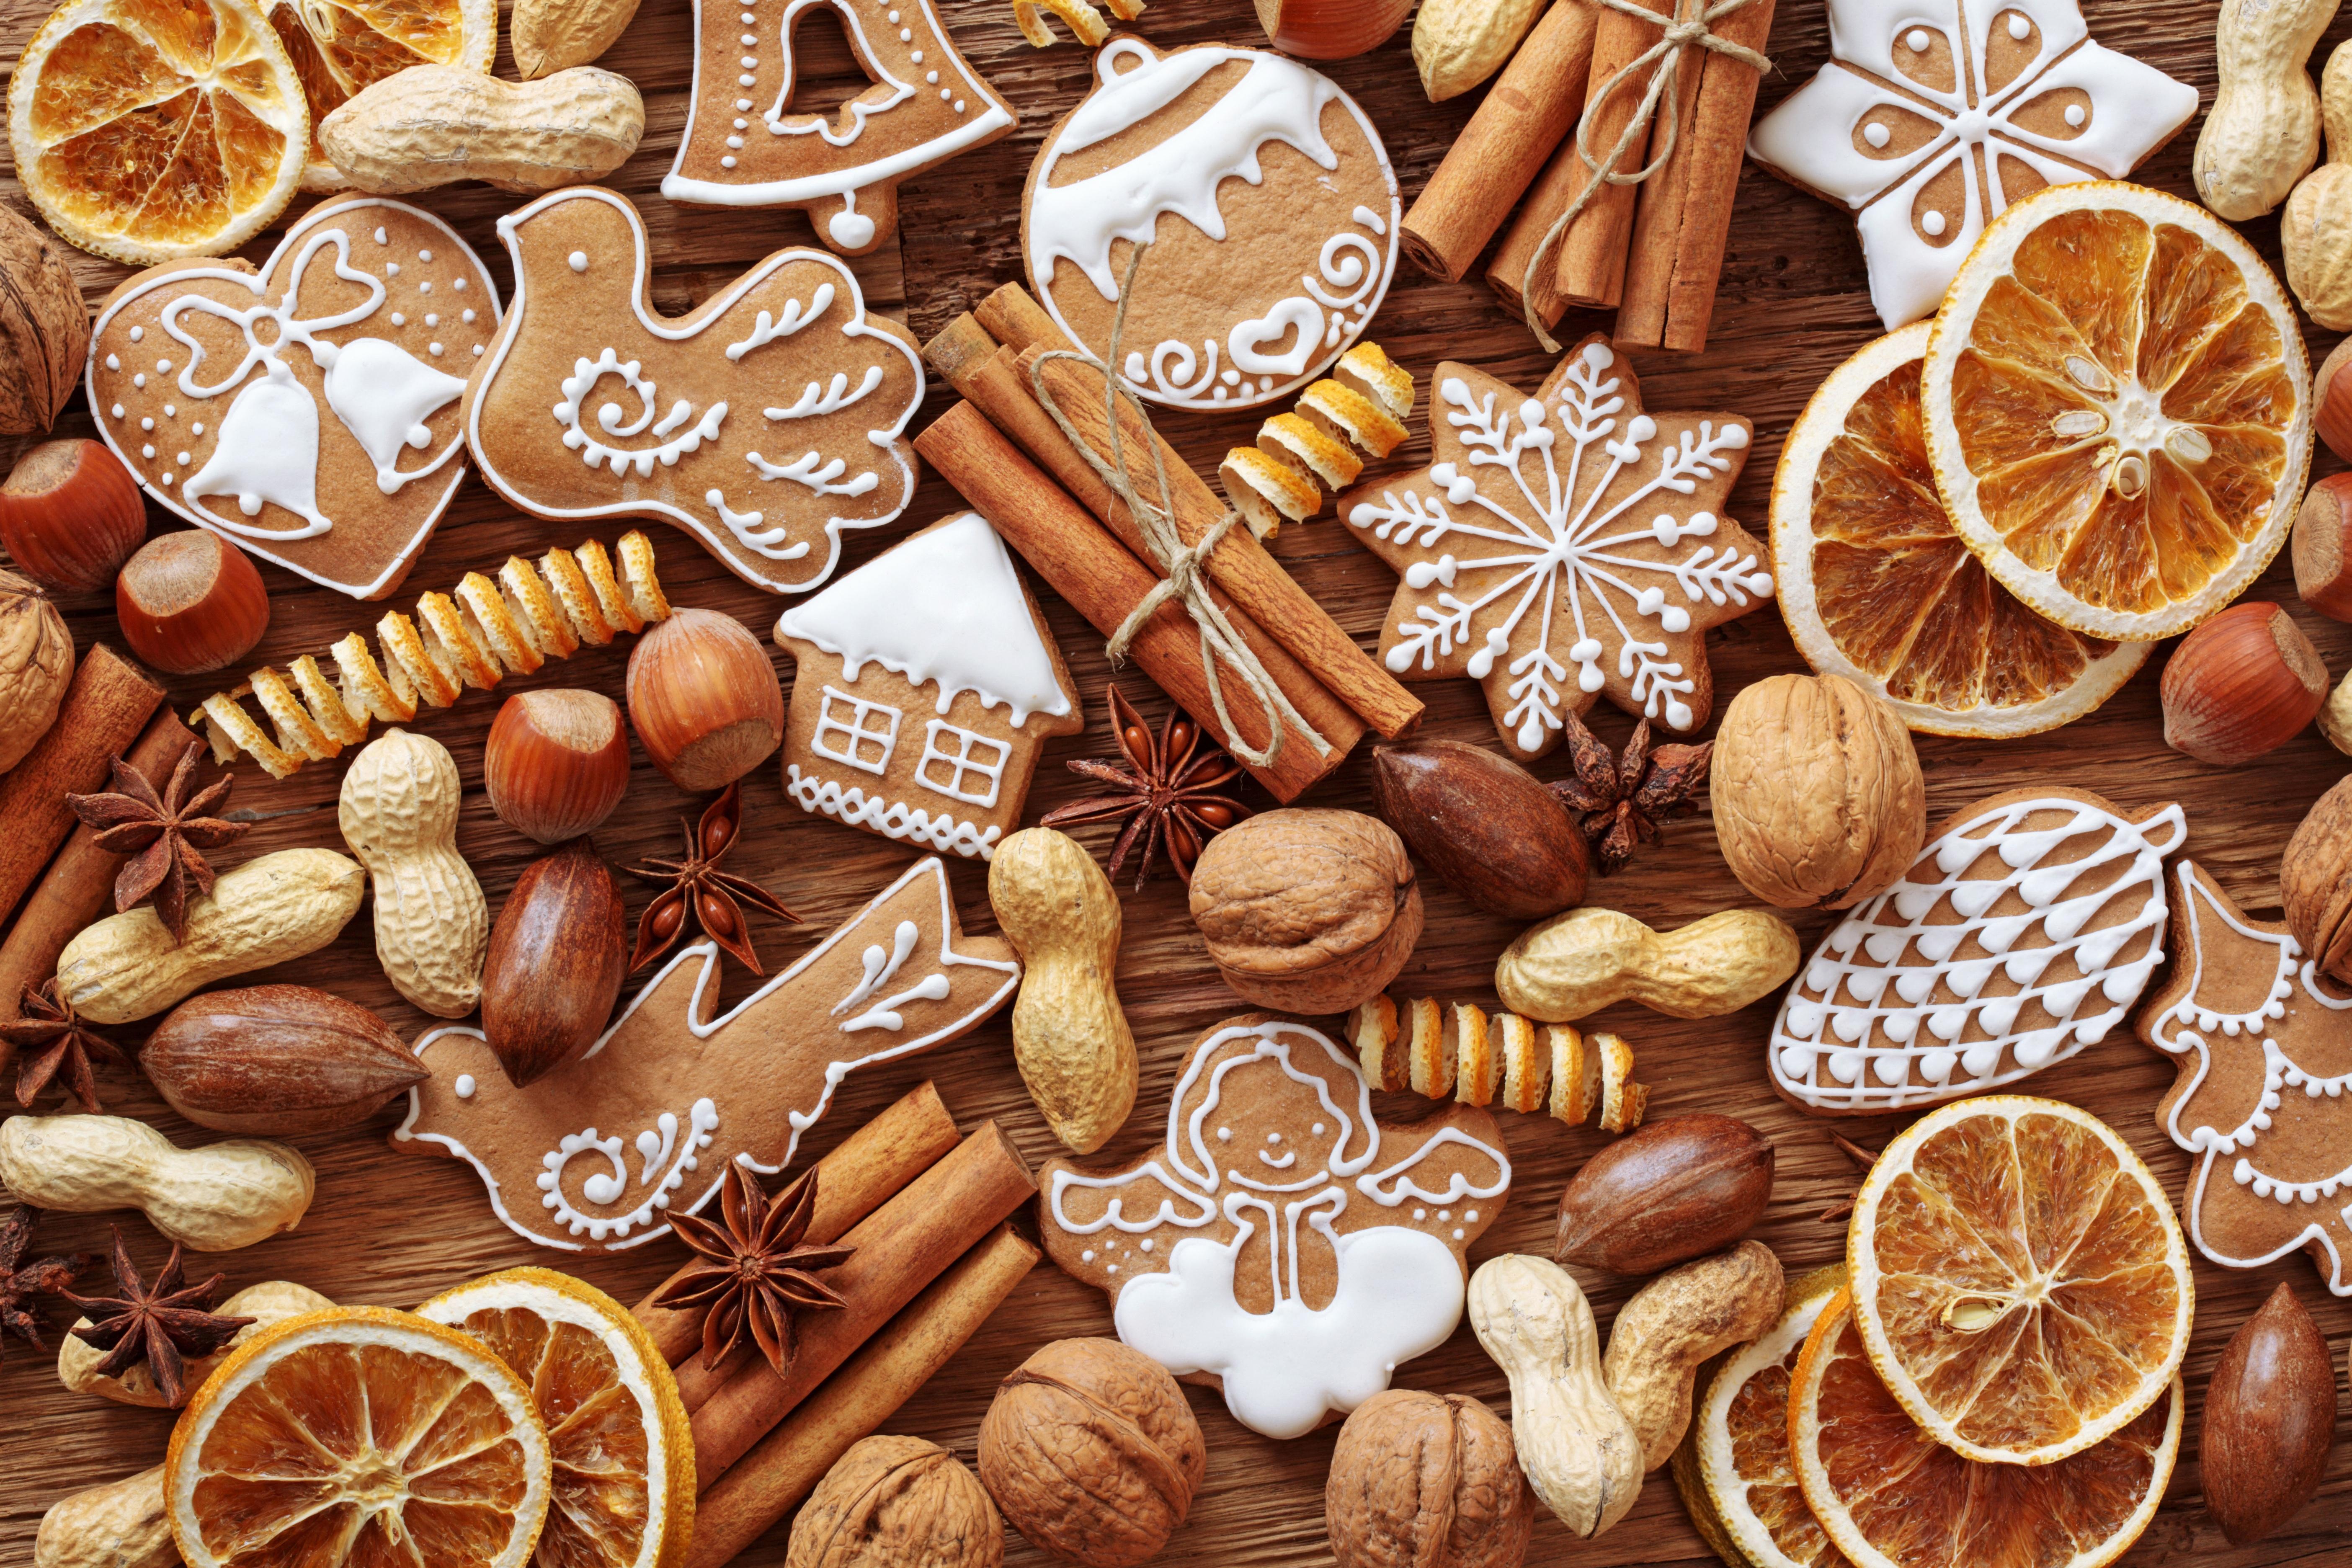 картинки коллаж сладости обитают засушливых